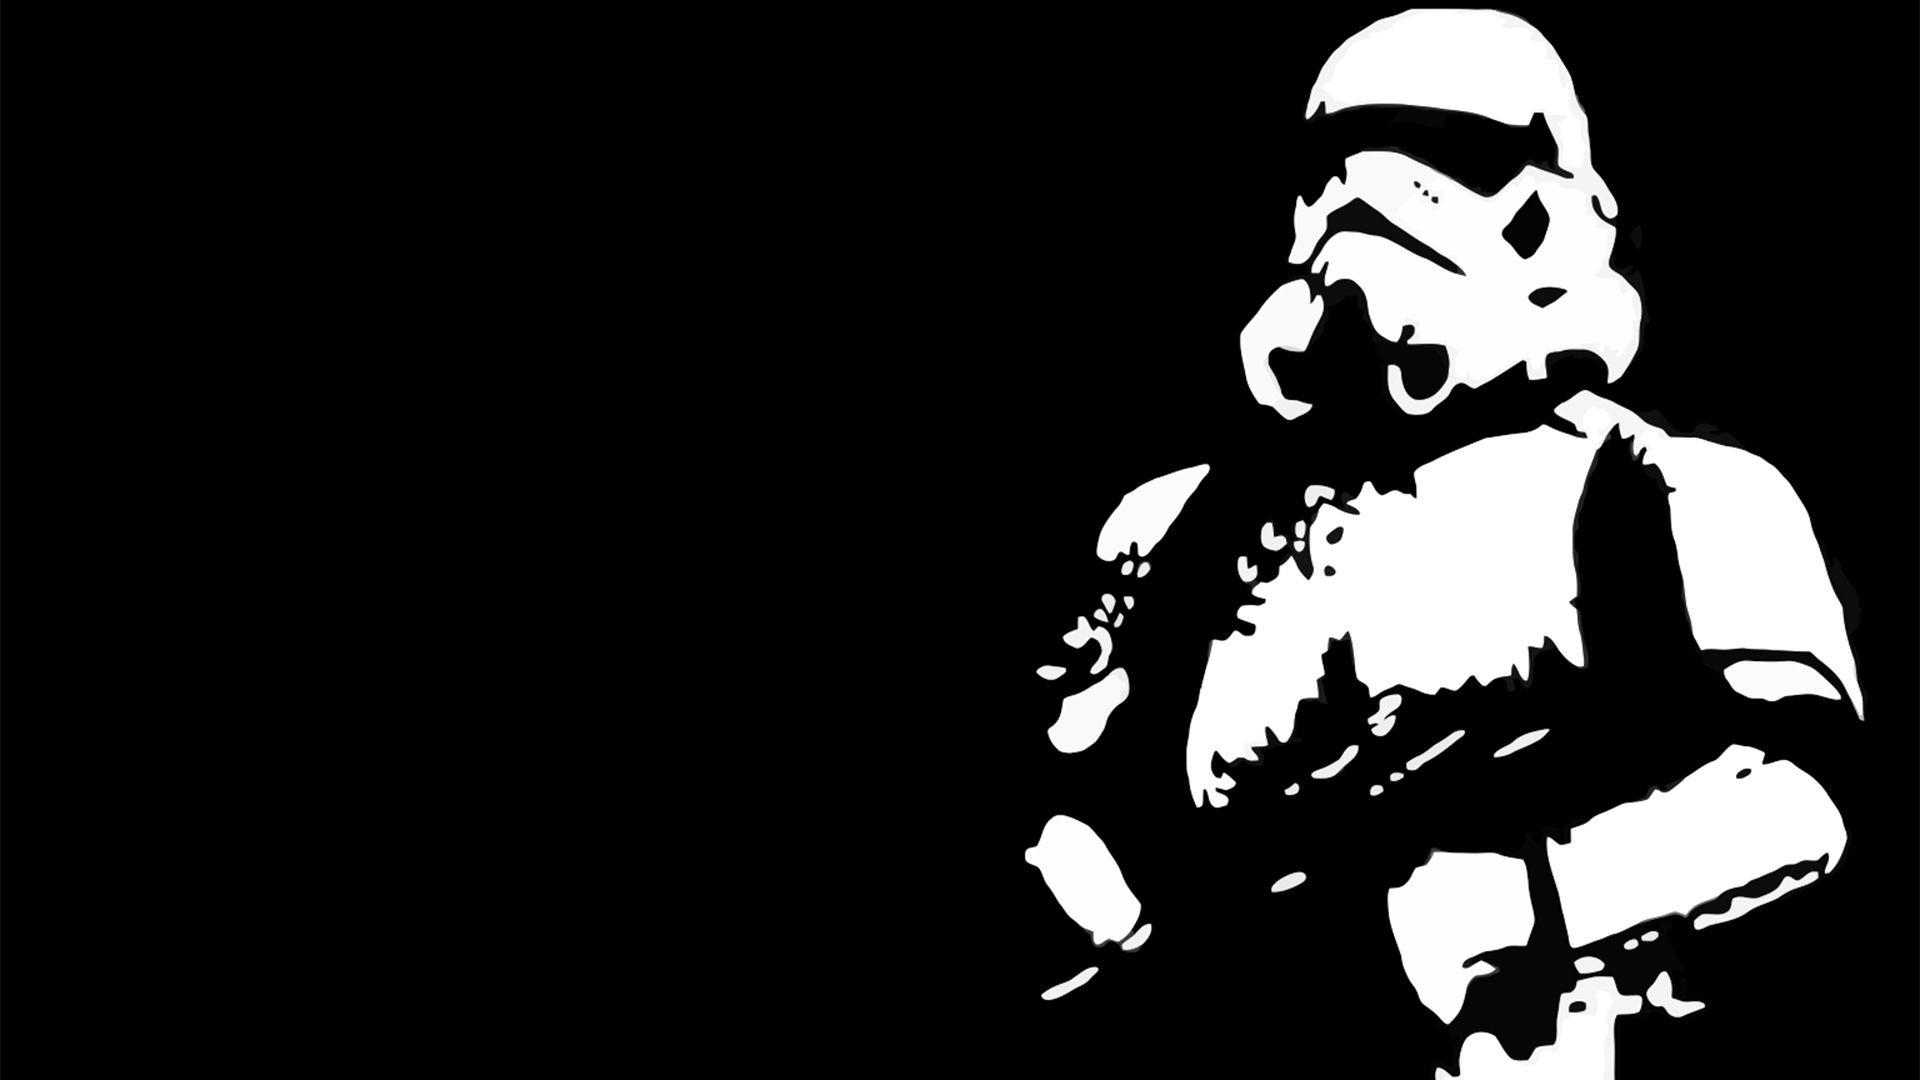 Star Wars Stormtrooper Wallpapers – Wallpaper Cave